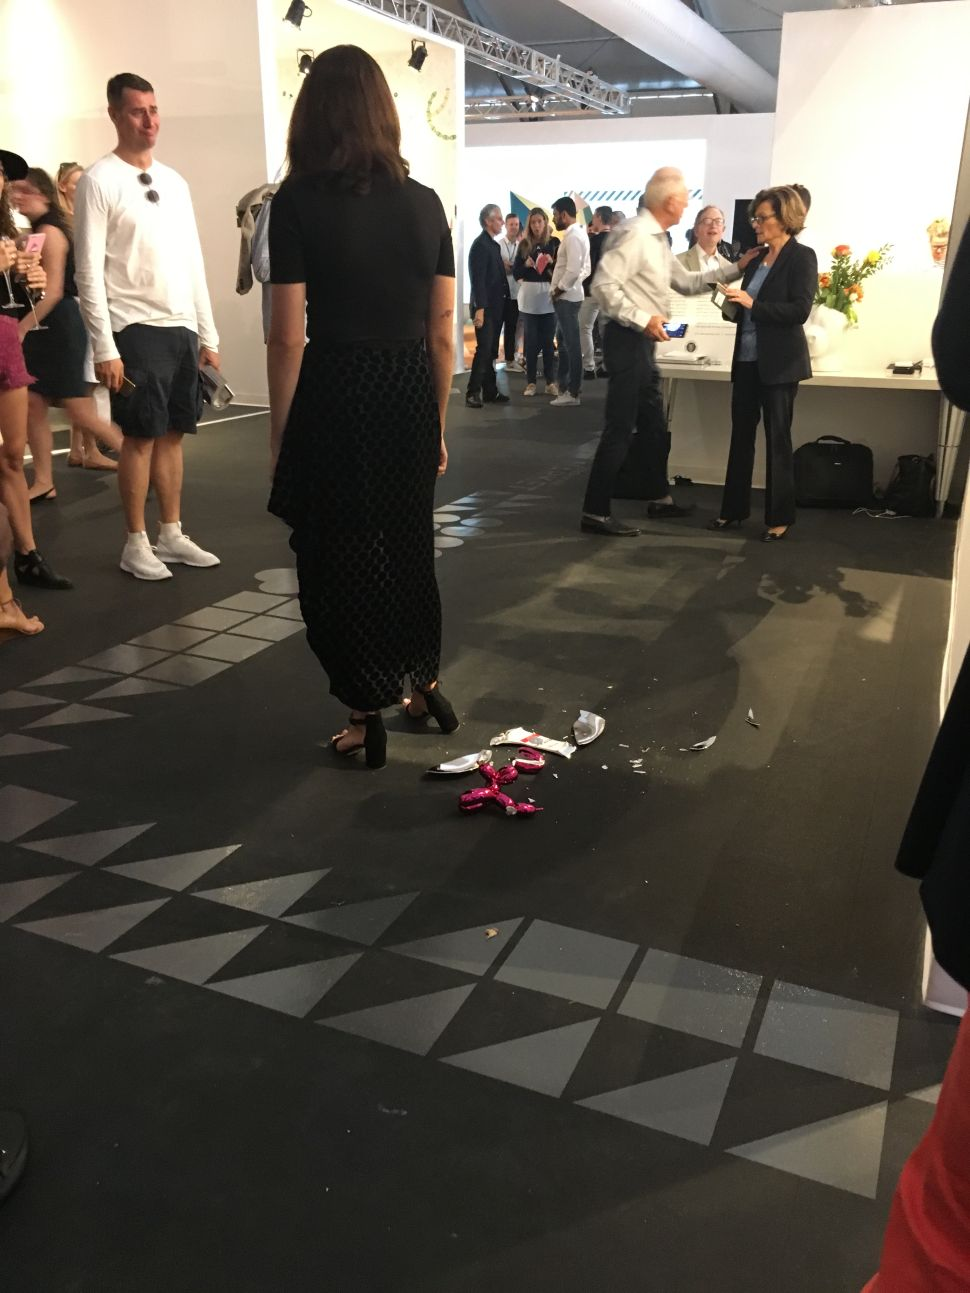 A broken Jeff Koons Ballon Dog